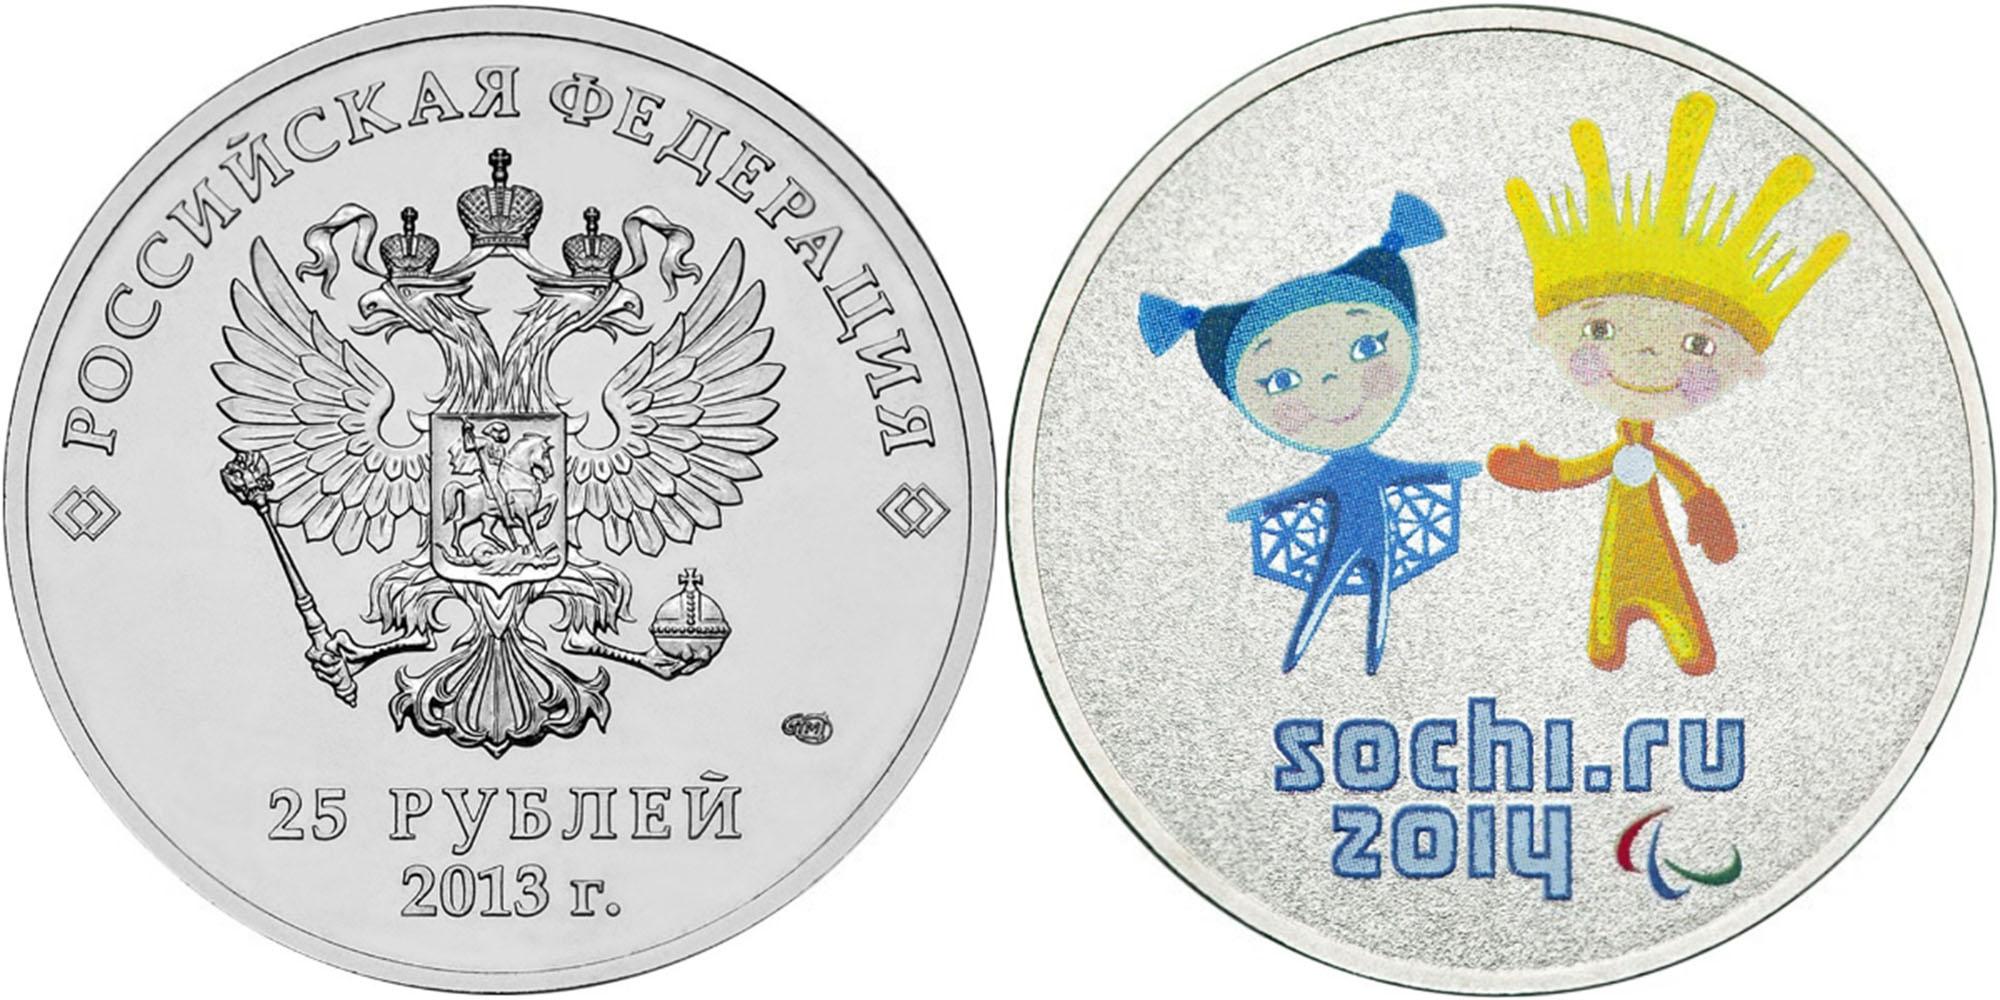 Монеты Сочи-2014